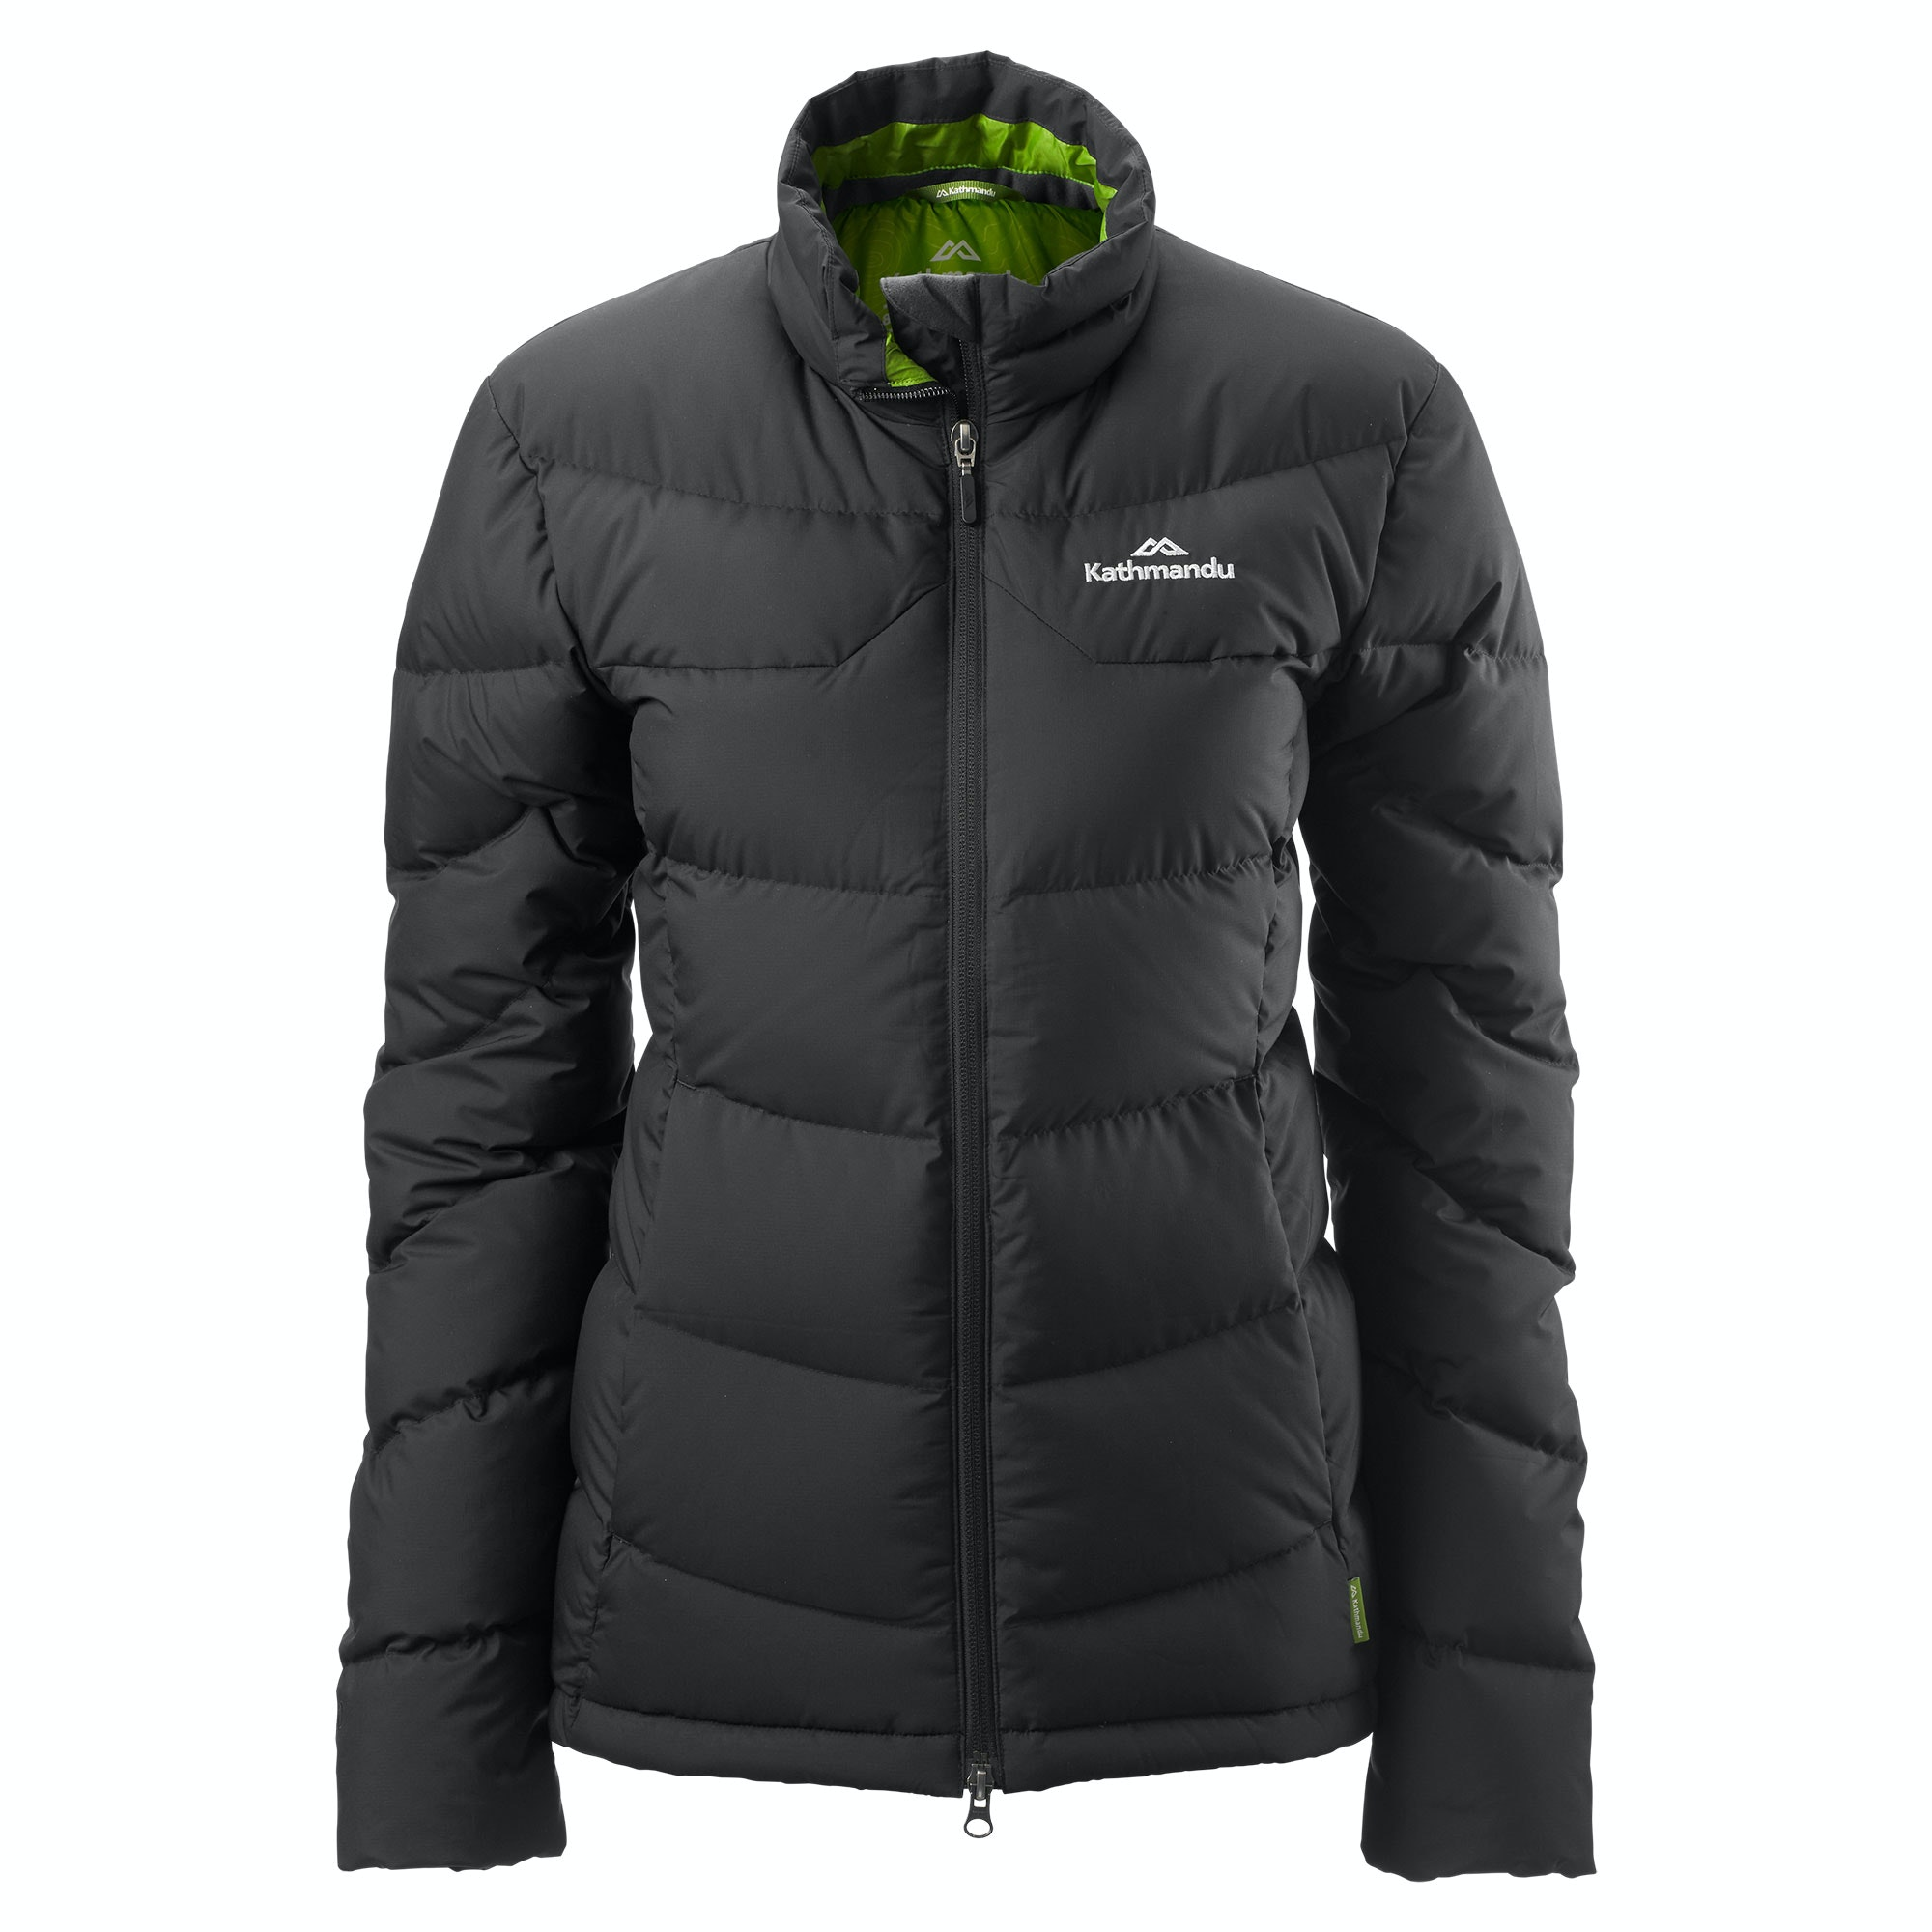 Kathmandu-Epiq-Women-039-s-Warm-Winter-Duck-Down-Puffer-Jacket-v2